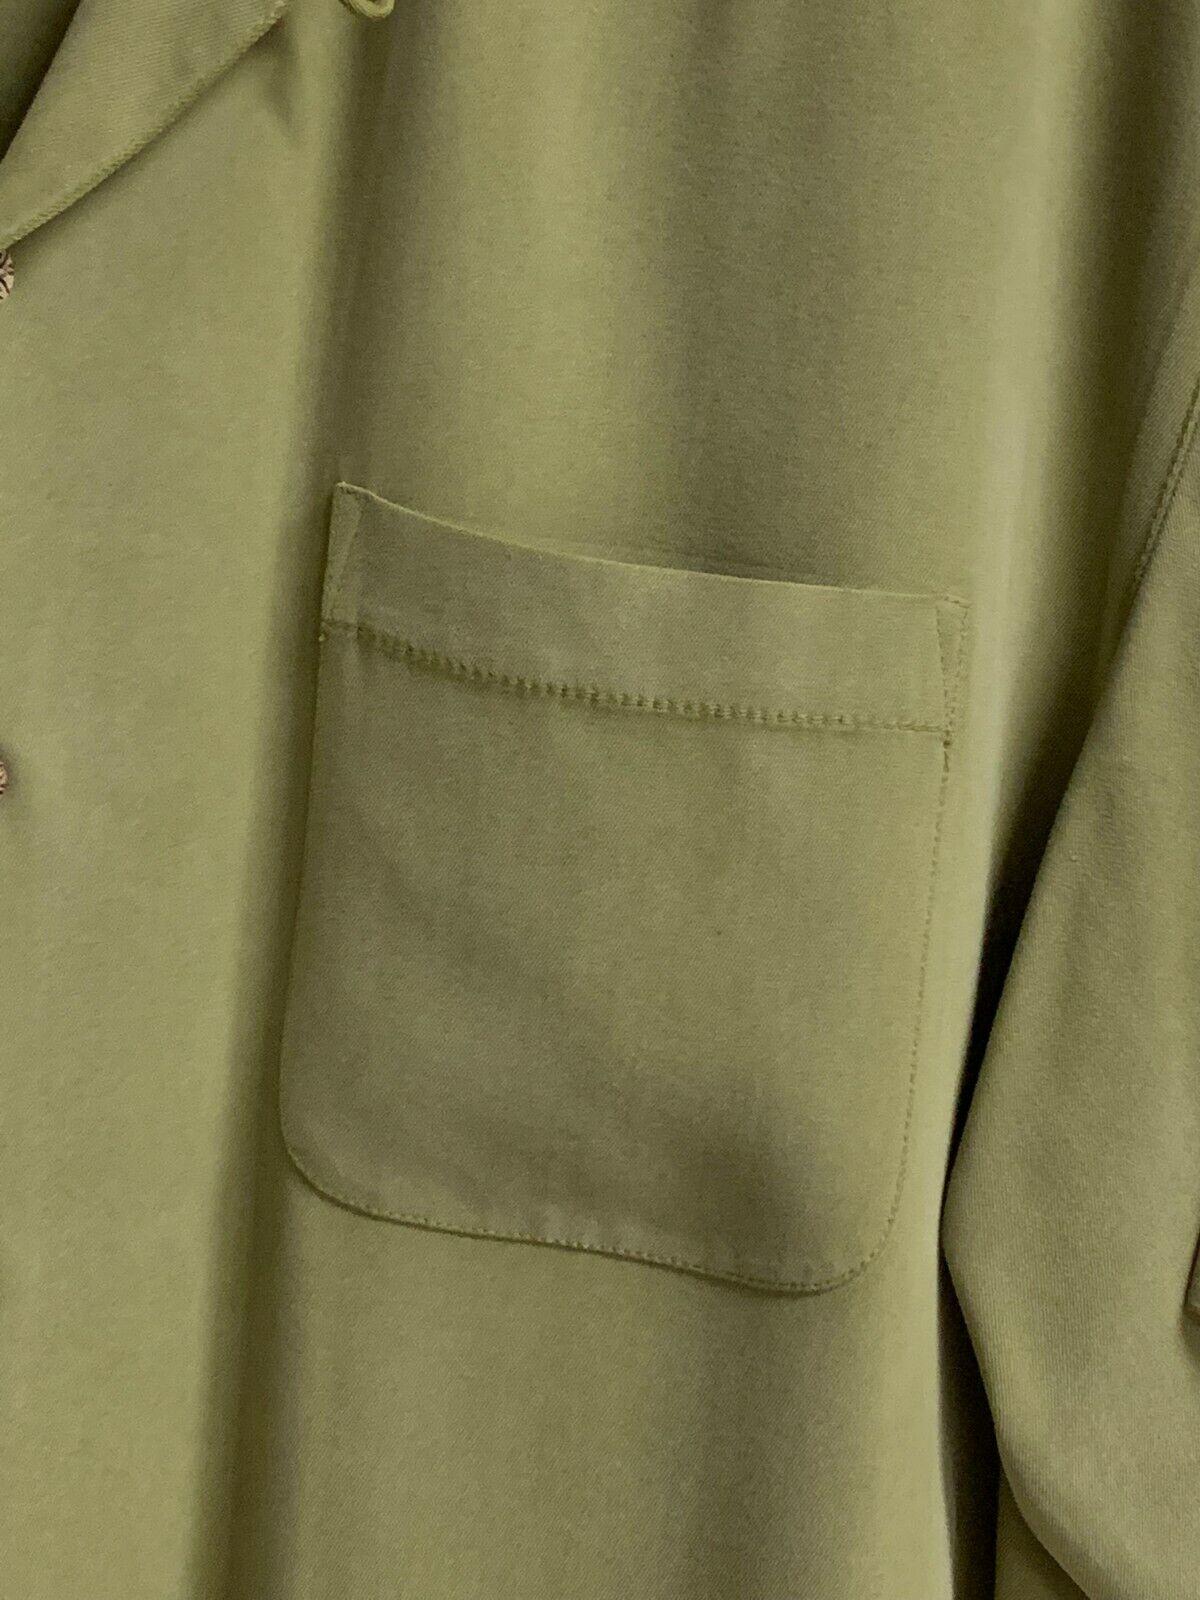 Green Tommy Bahama 100% Silk Shirt - image 5